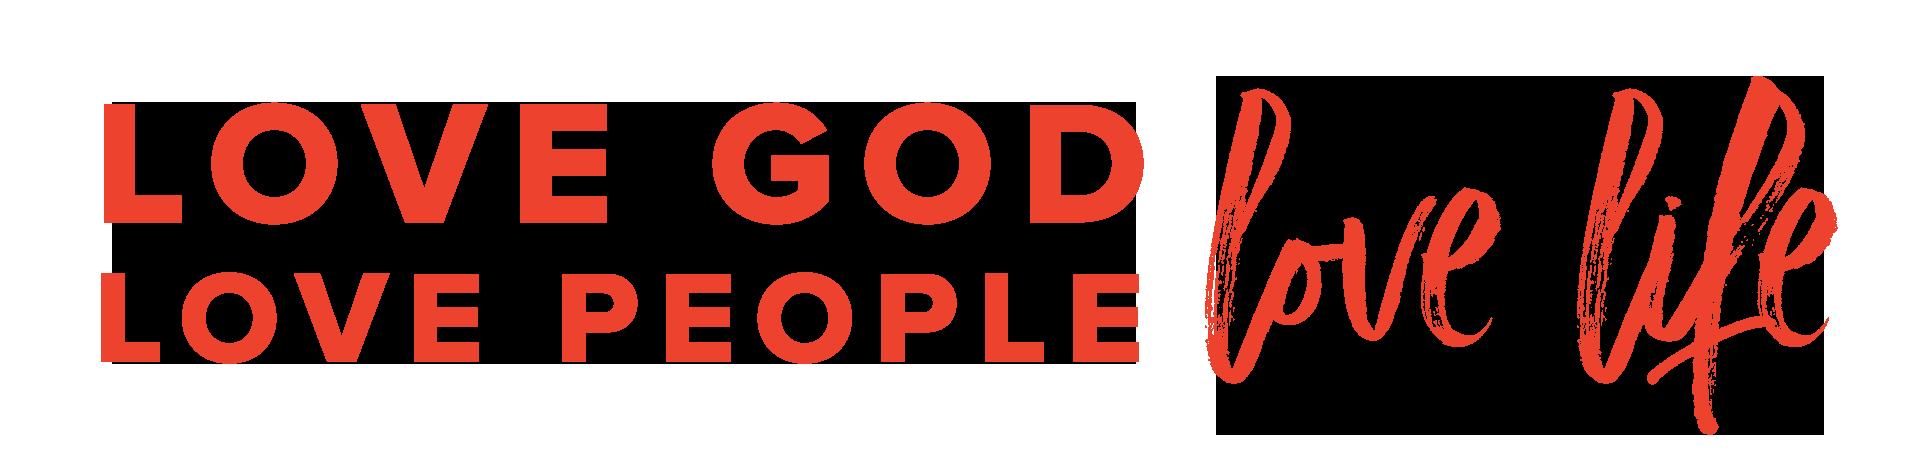 love god-people-life